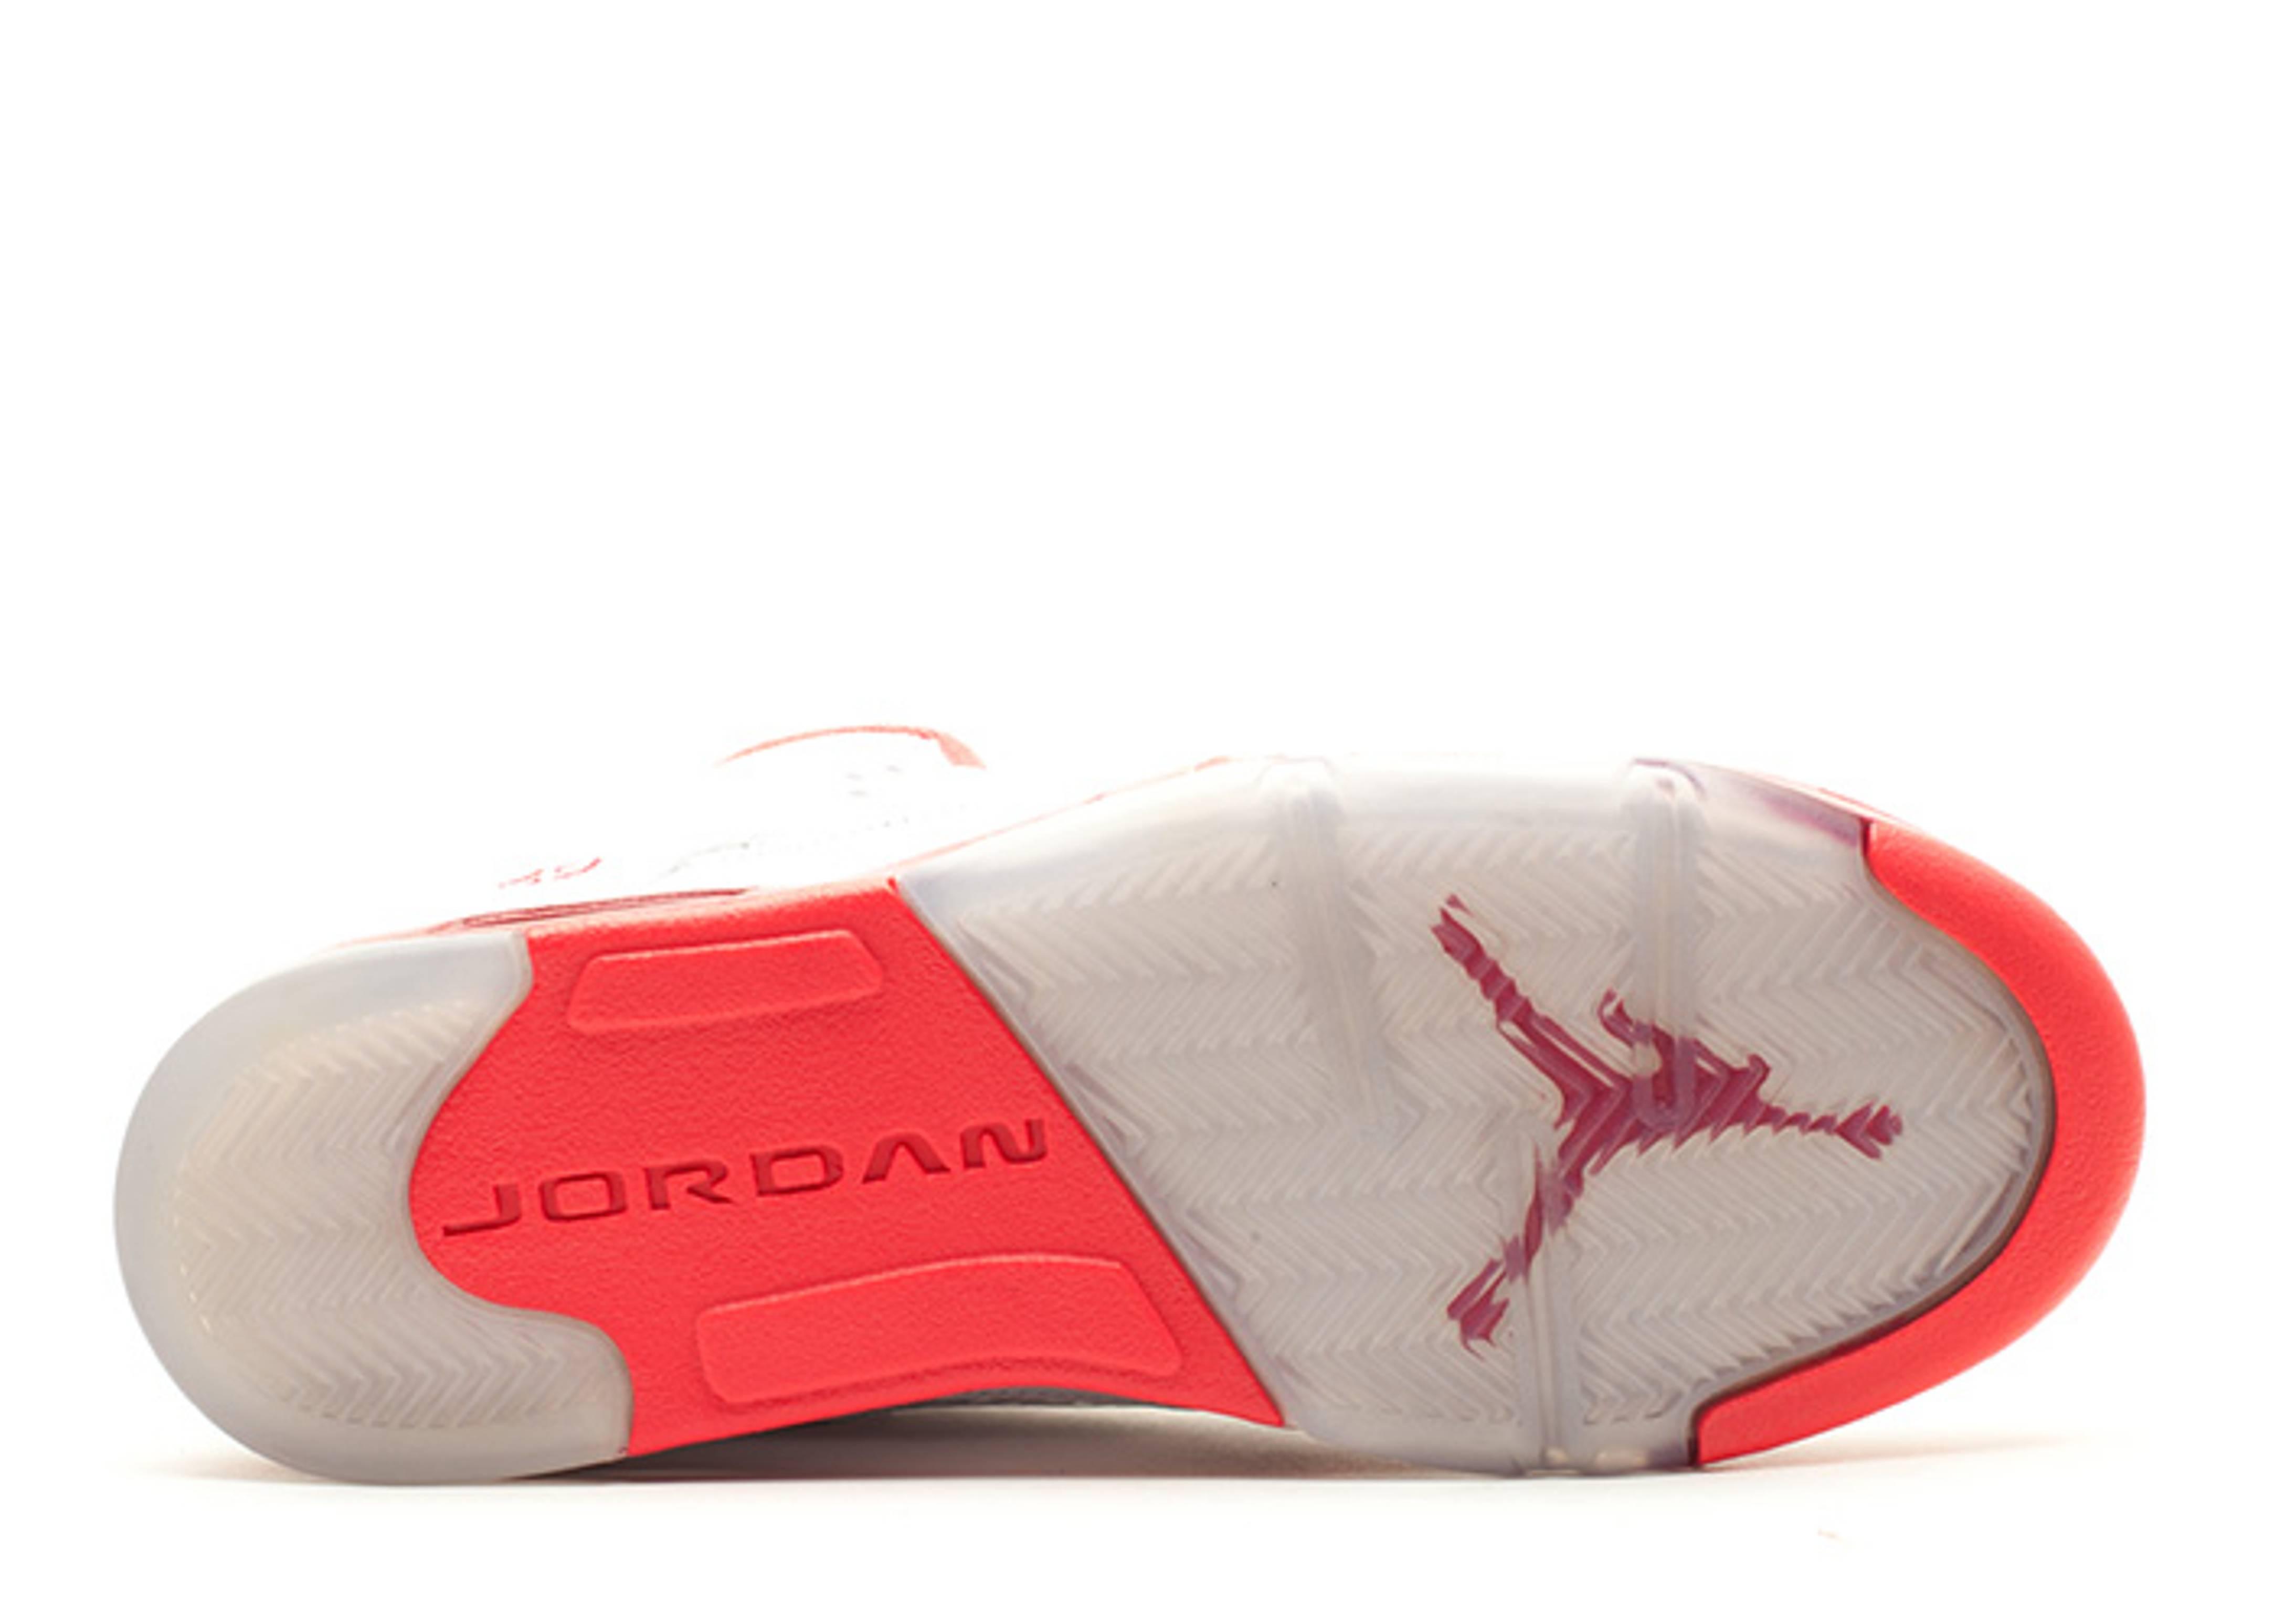 538ae10b3ae9ac ... 2011 Nike Air Jordan V 5 Retro White Legacy Red Scarlet Fire 6Y Bape  Supreme DMP girls air jordan 5 retro (gs) ...